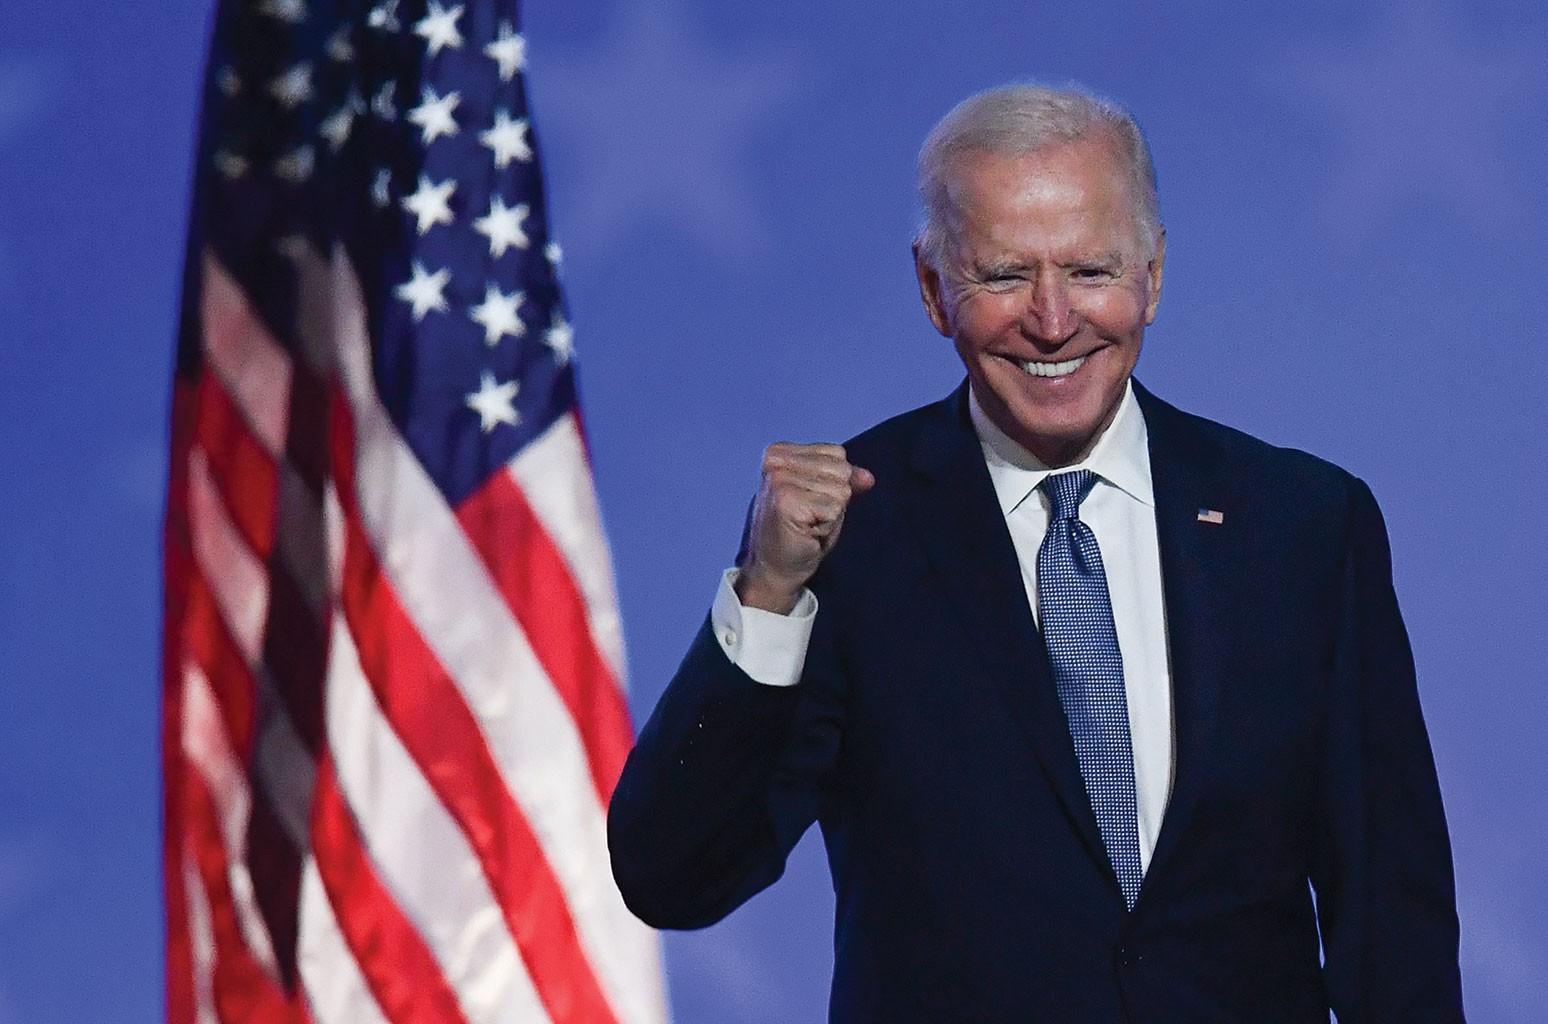 Joe Biden presidential nominee